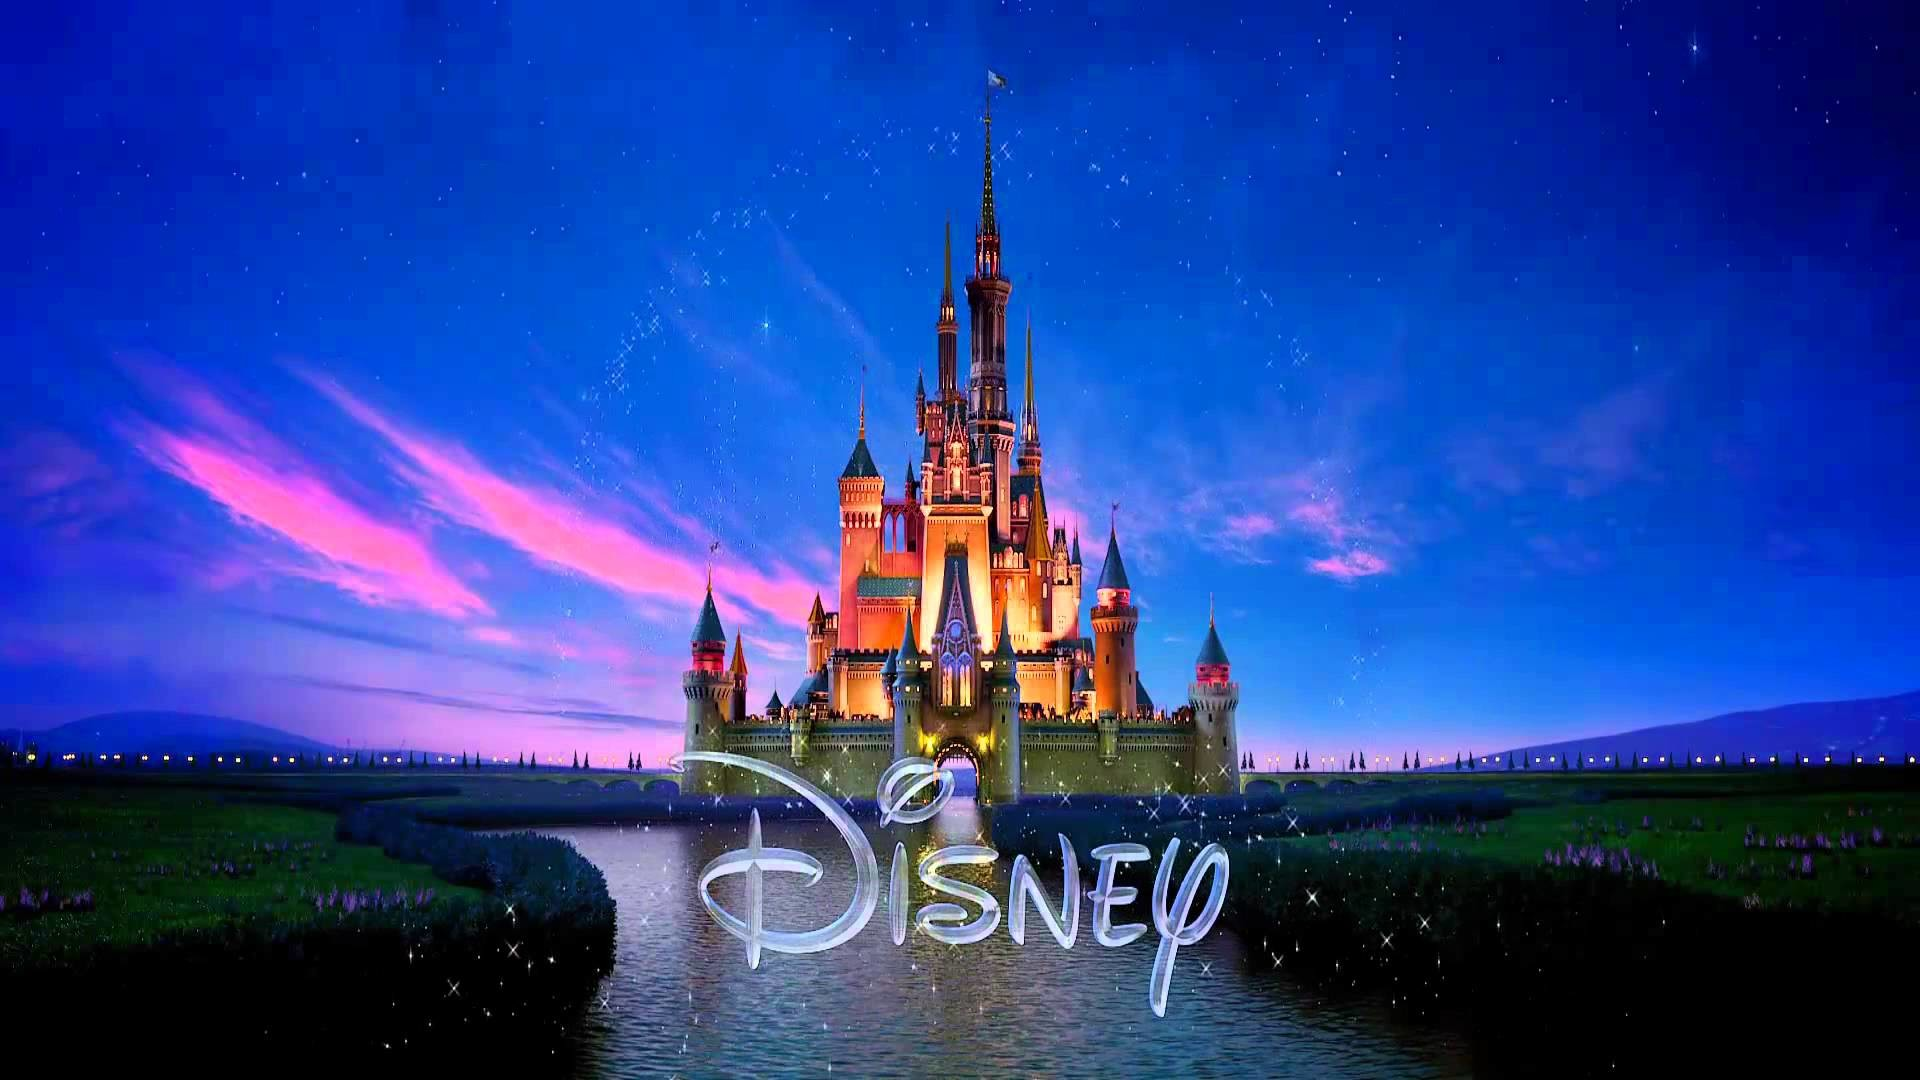 Disney Logo Wallpaper ·①